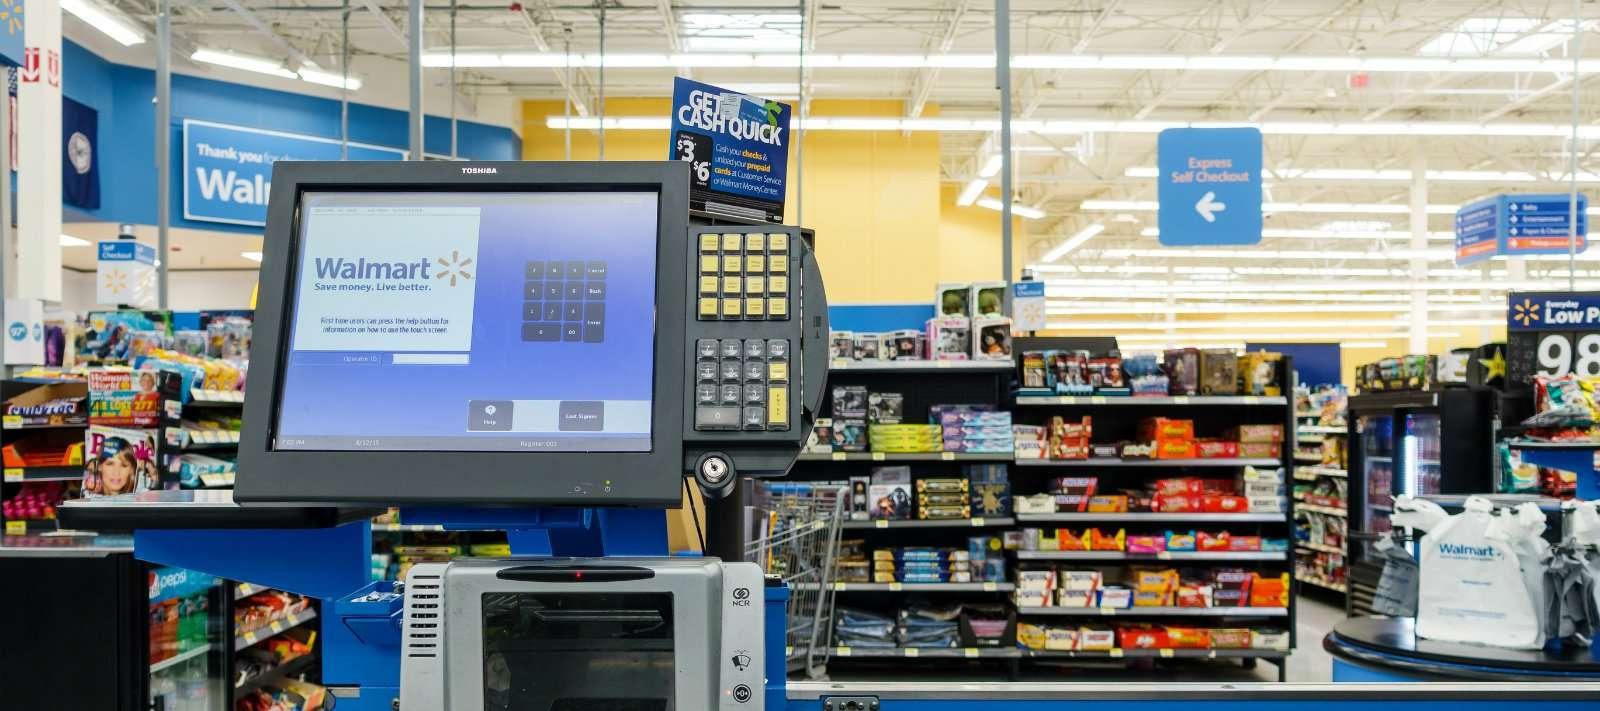 Digital Transformation Stories in Retail: Starbucks, Walmart